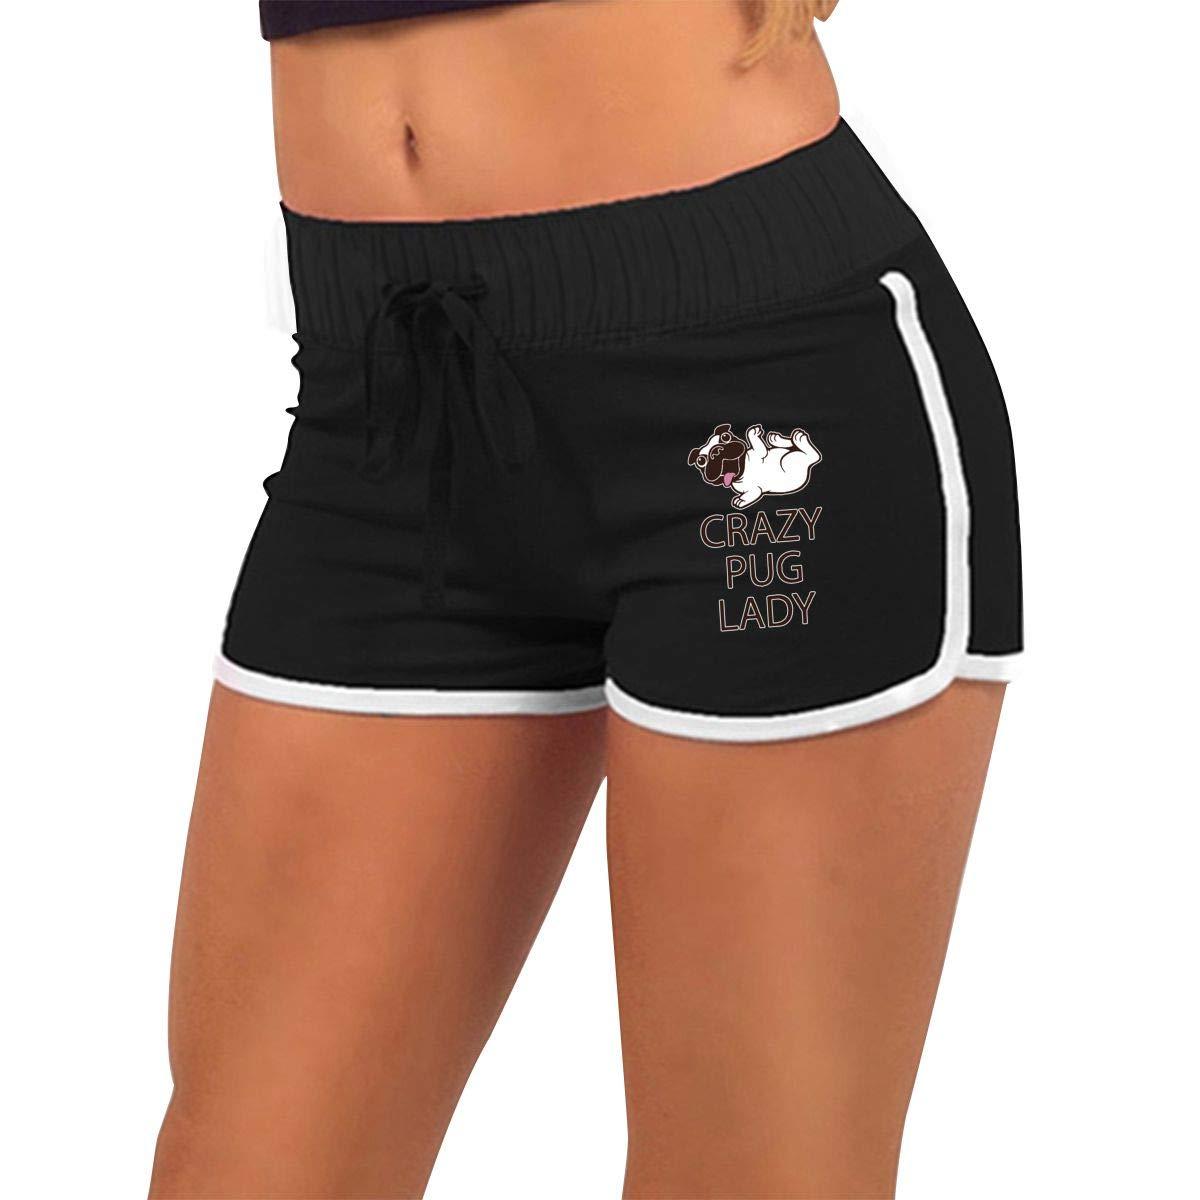 Womens Fashion Crazy Pug Lady Jogger Sweatpant Bodybuilding Gym Hot Shorts Black